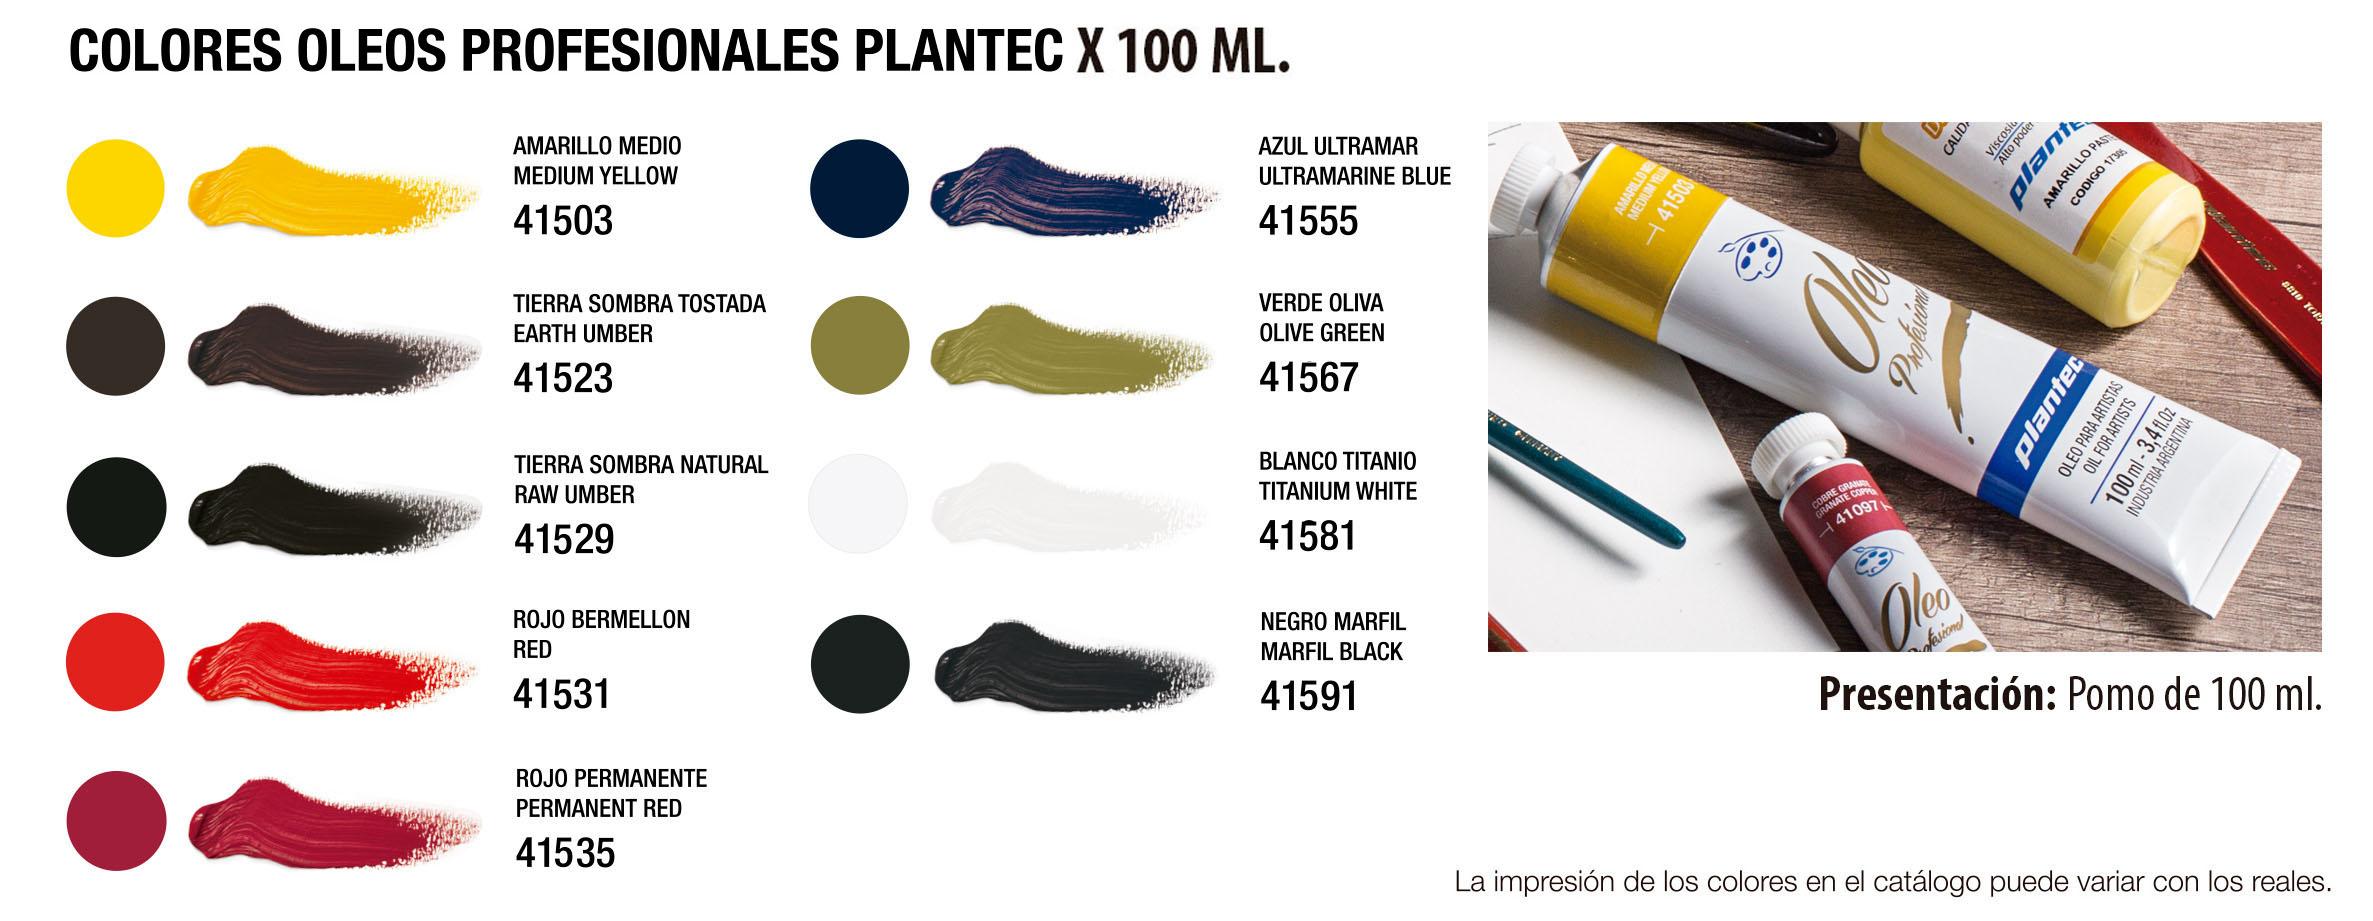 colores-pintura-al-oleo-profesional-pomo-20-100-ml-plantec